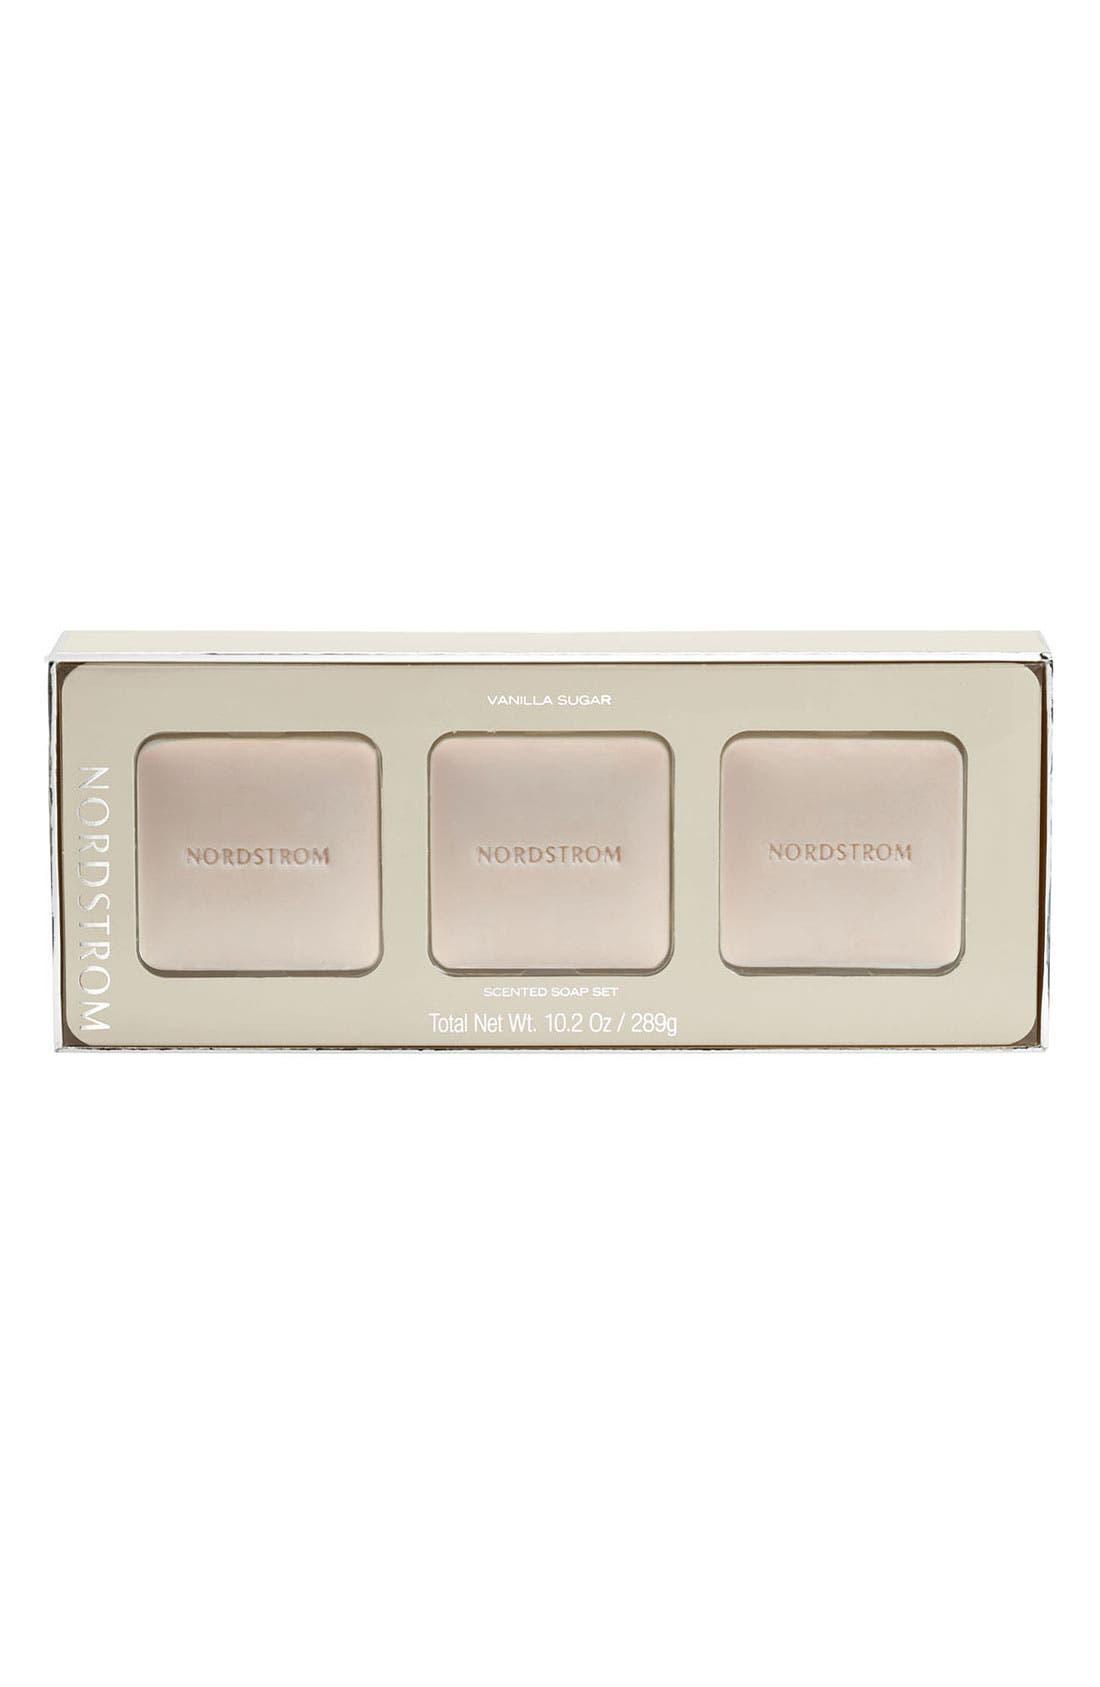 Alternate Image 1 Selected - Nordstrom 'Vanilla Sugar' Scented Soap Set